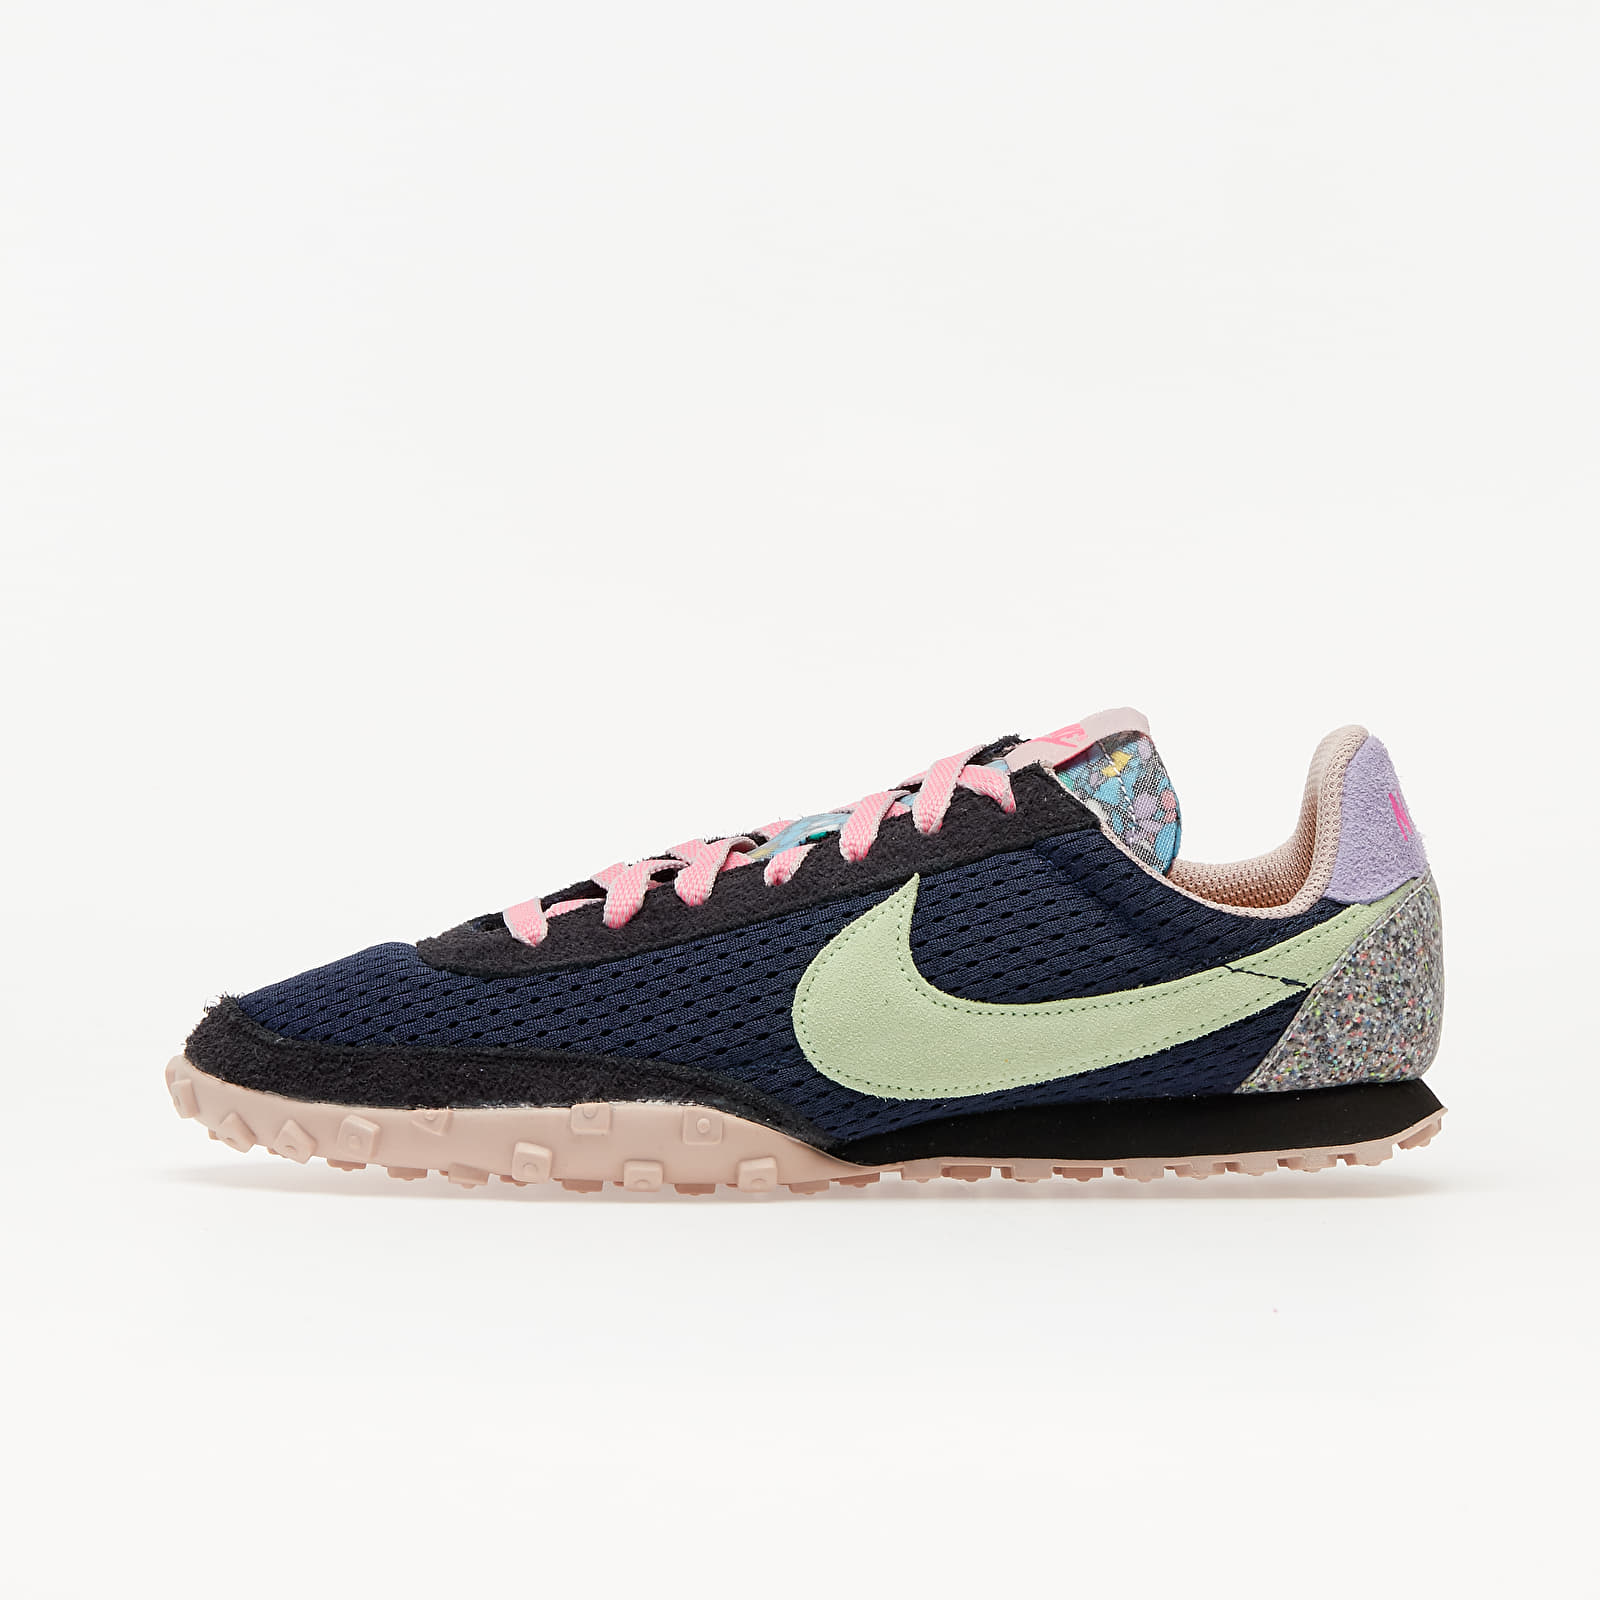 Pánské tenisky a boty Nike Waffle Racer Midnight Navy/ Vapor Green-Black